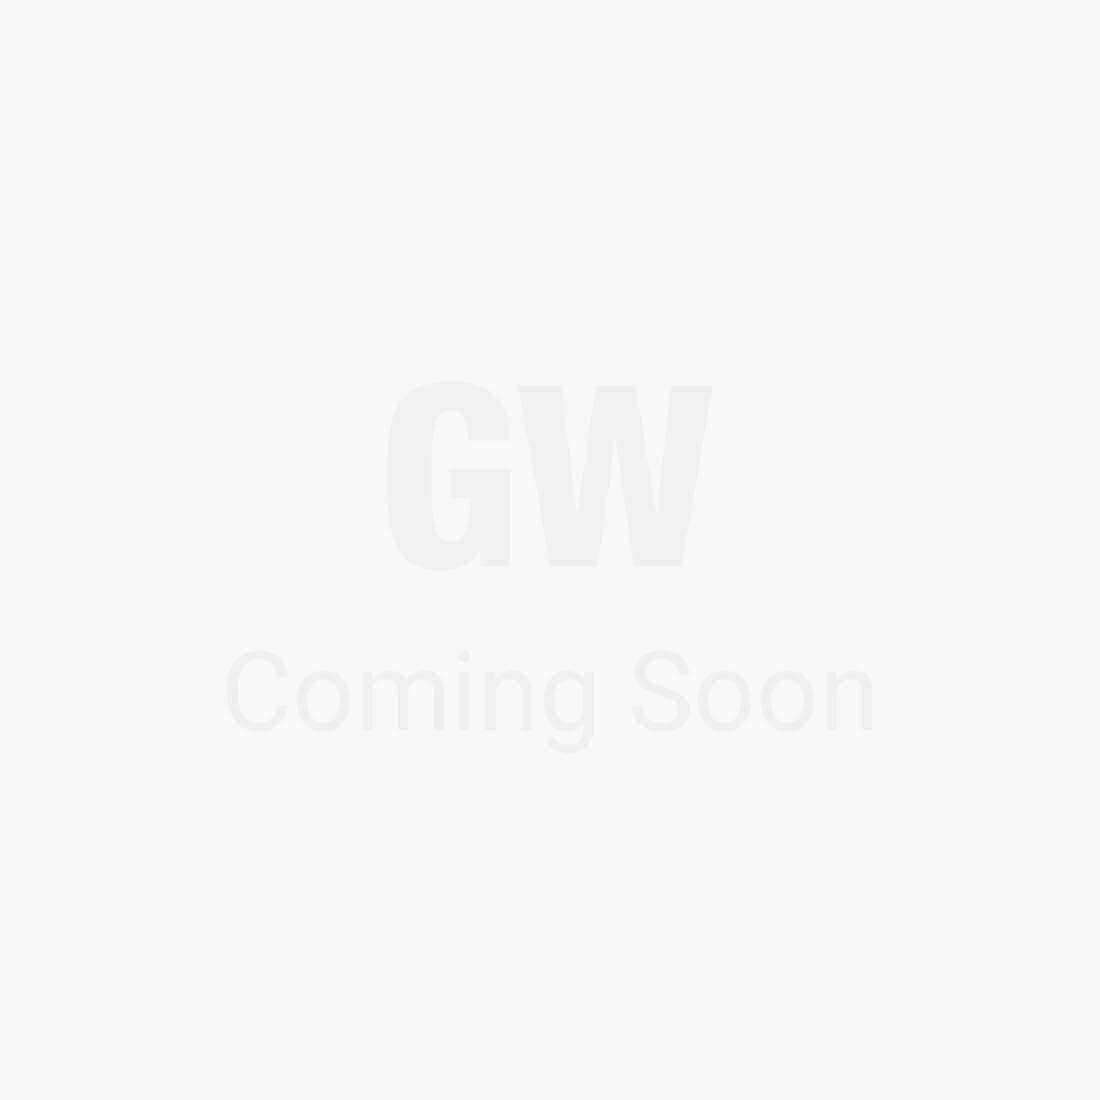 Hugo Layer Bench